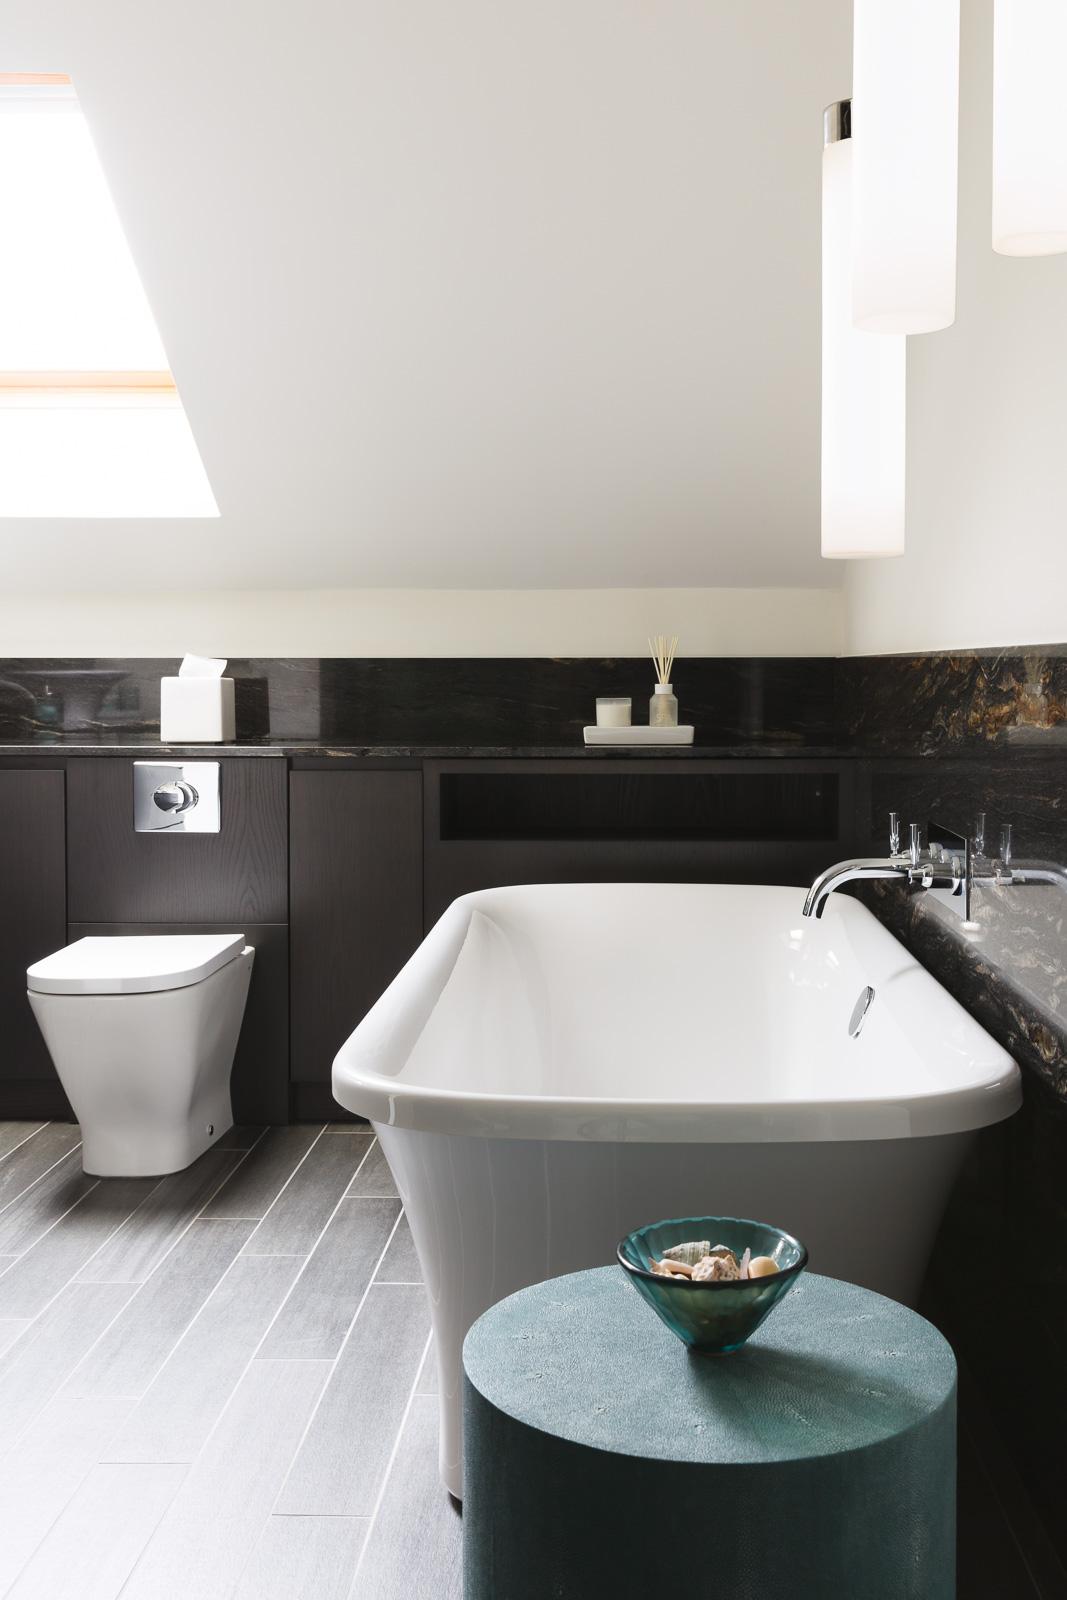 Bespoke Contemporary Luxury Bathroom Design | Fife | Perth ...